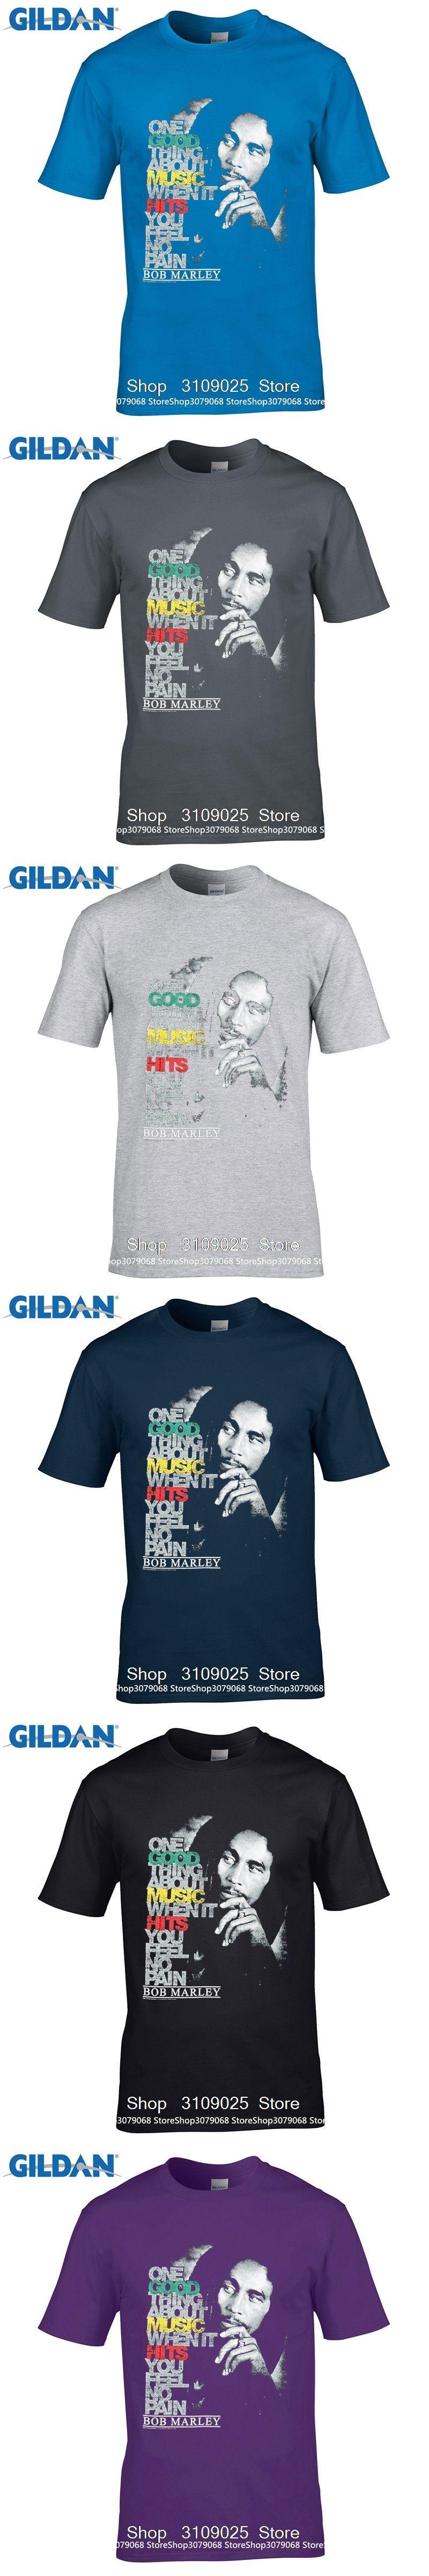 580568651 GILDAN DIY Style s t shirts Newest 2017 Fashion Stranger Things T Shirt Bob  Marley Good Music